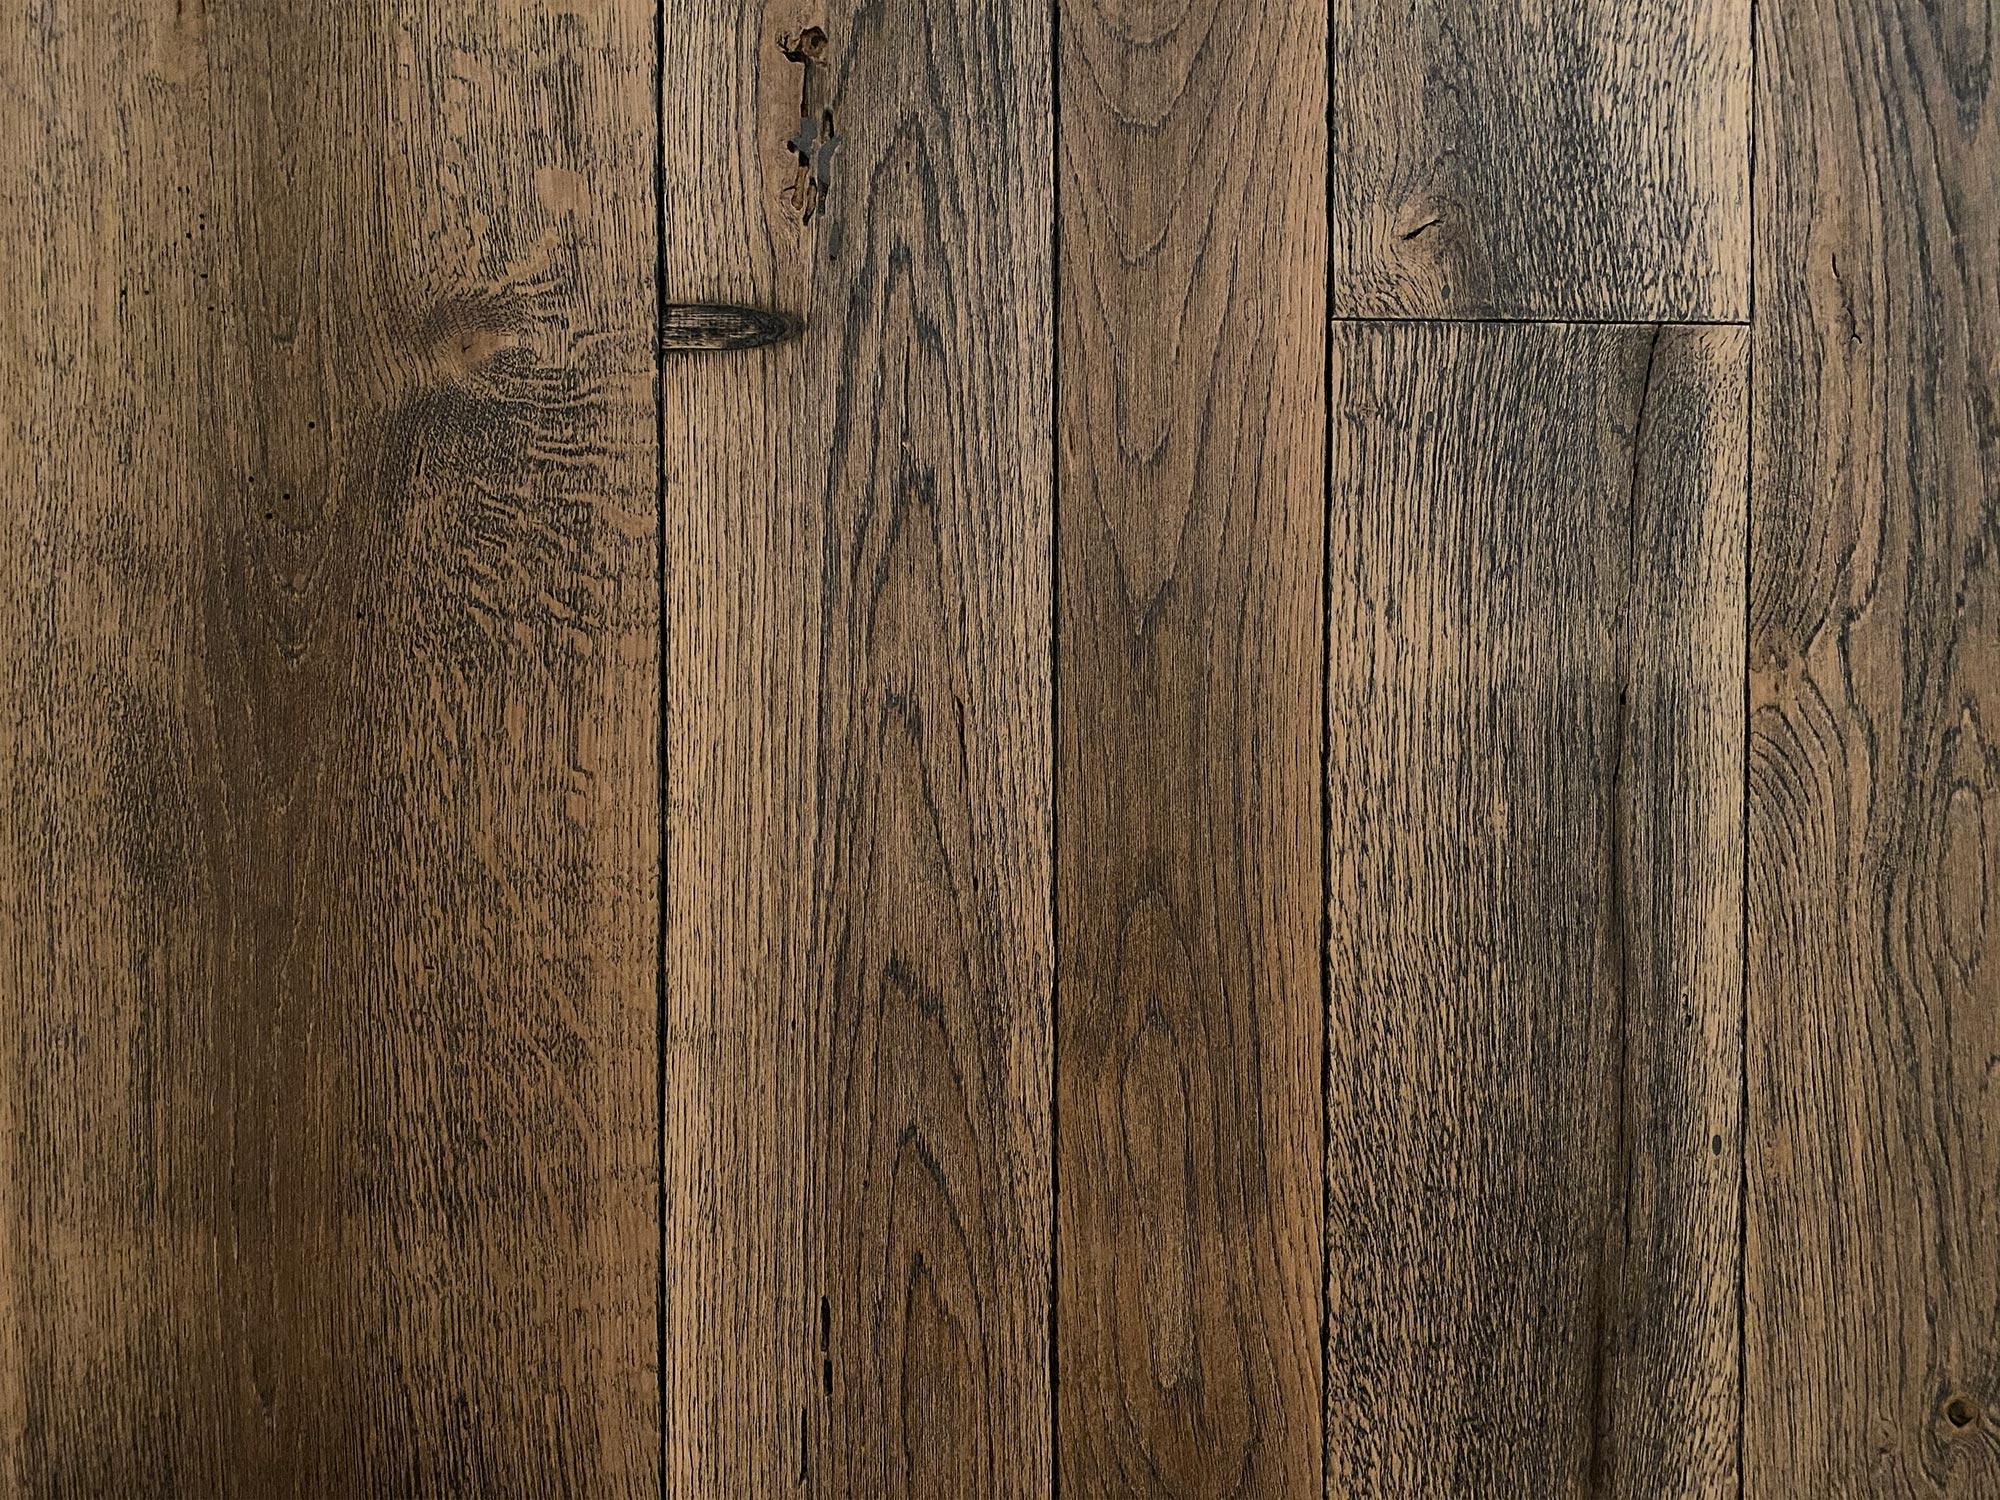 Reclaimed wood flooring with oak finish